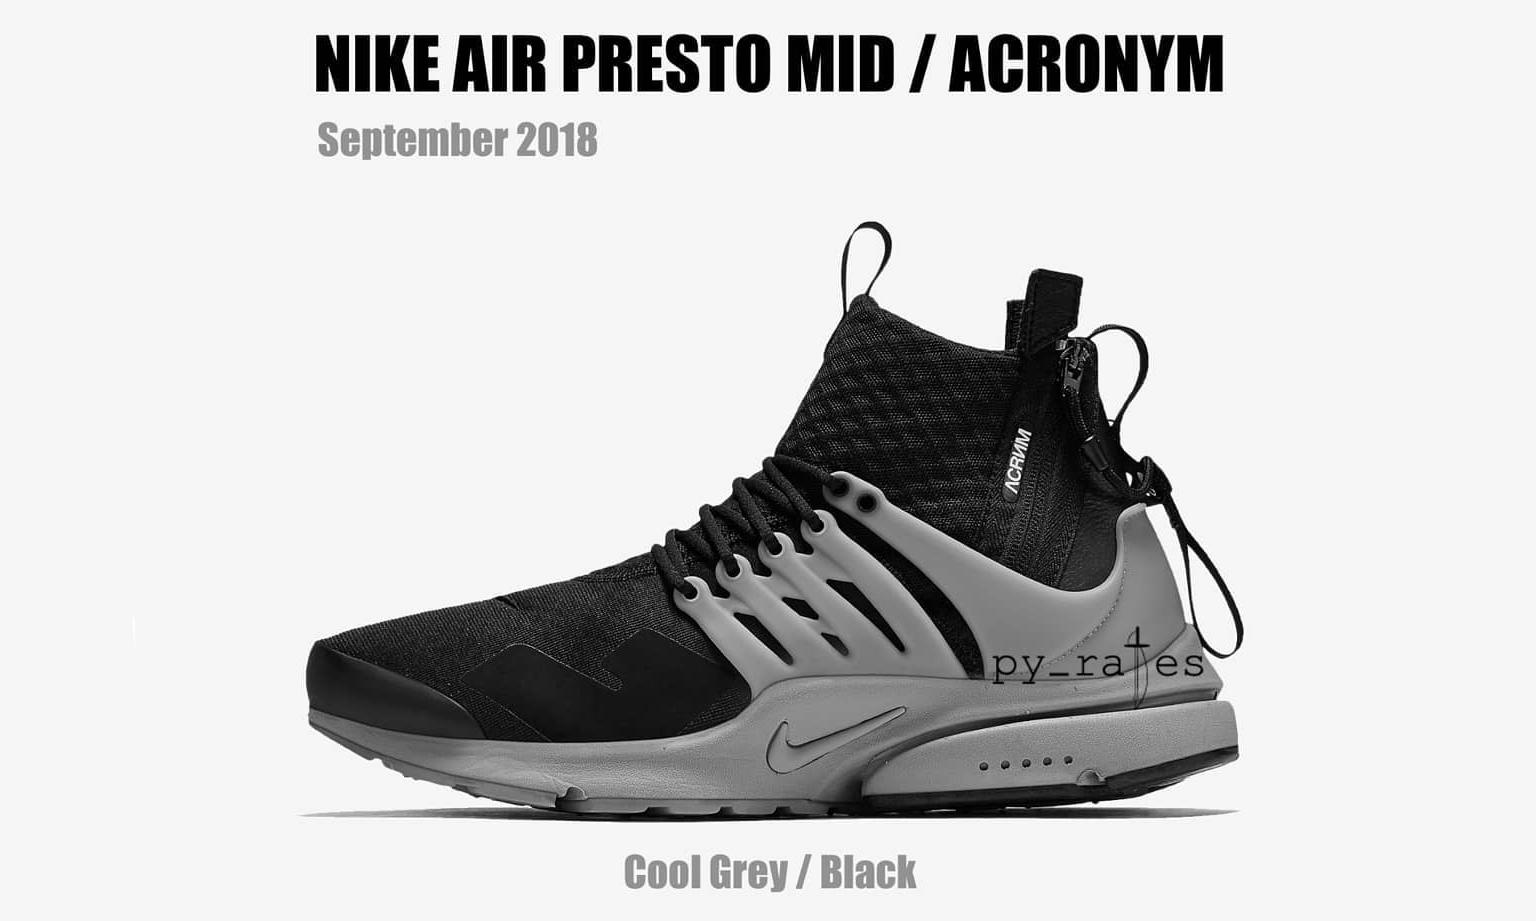 ACRONYM® x NikeLab Air Presto Mid 新配色渲染图预览